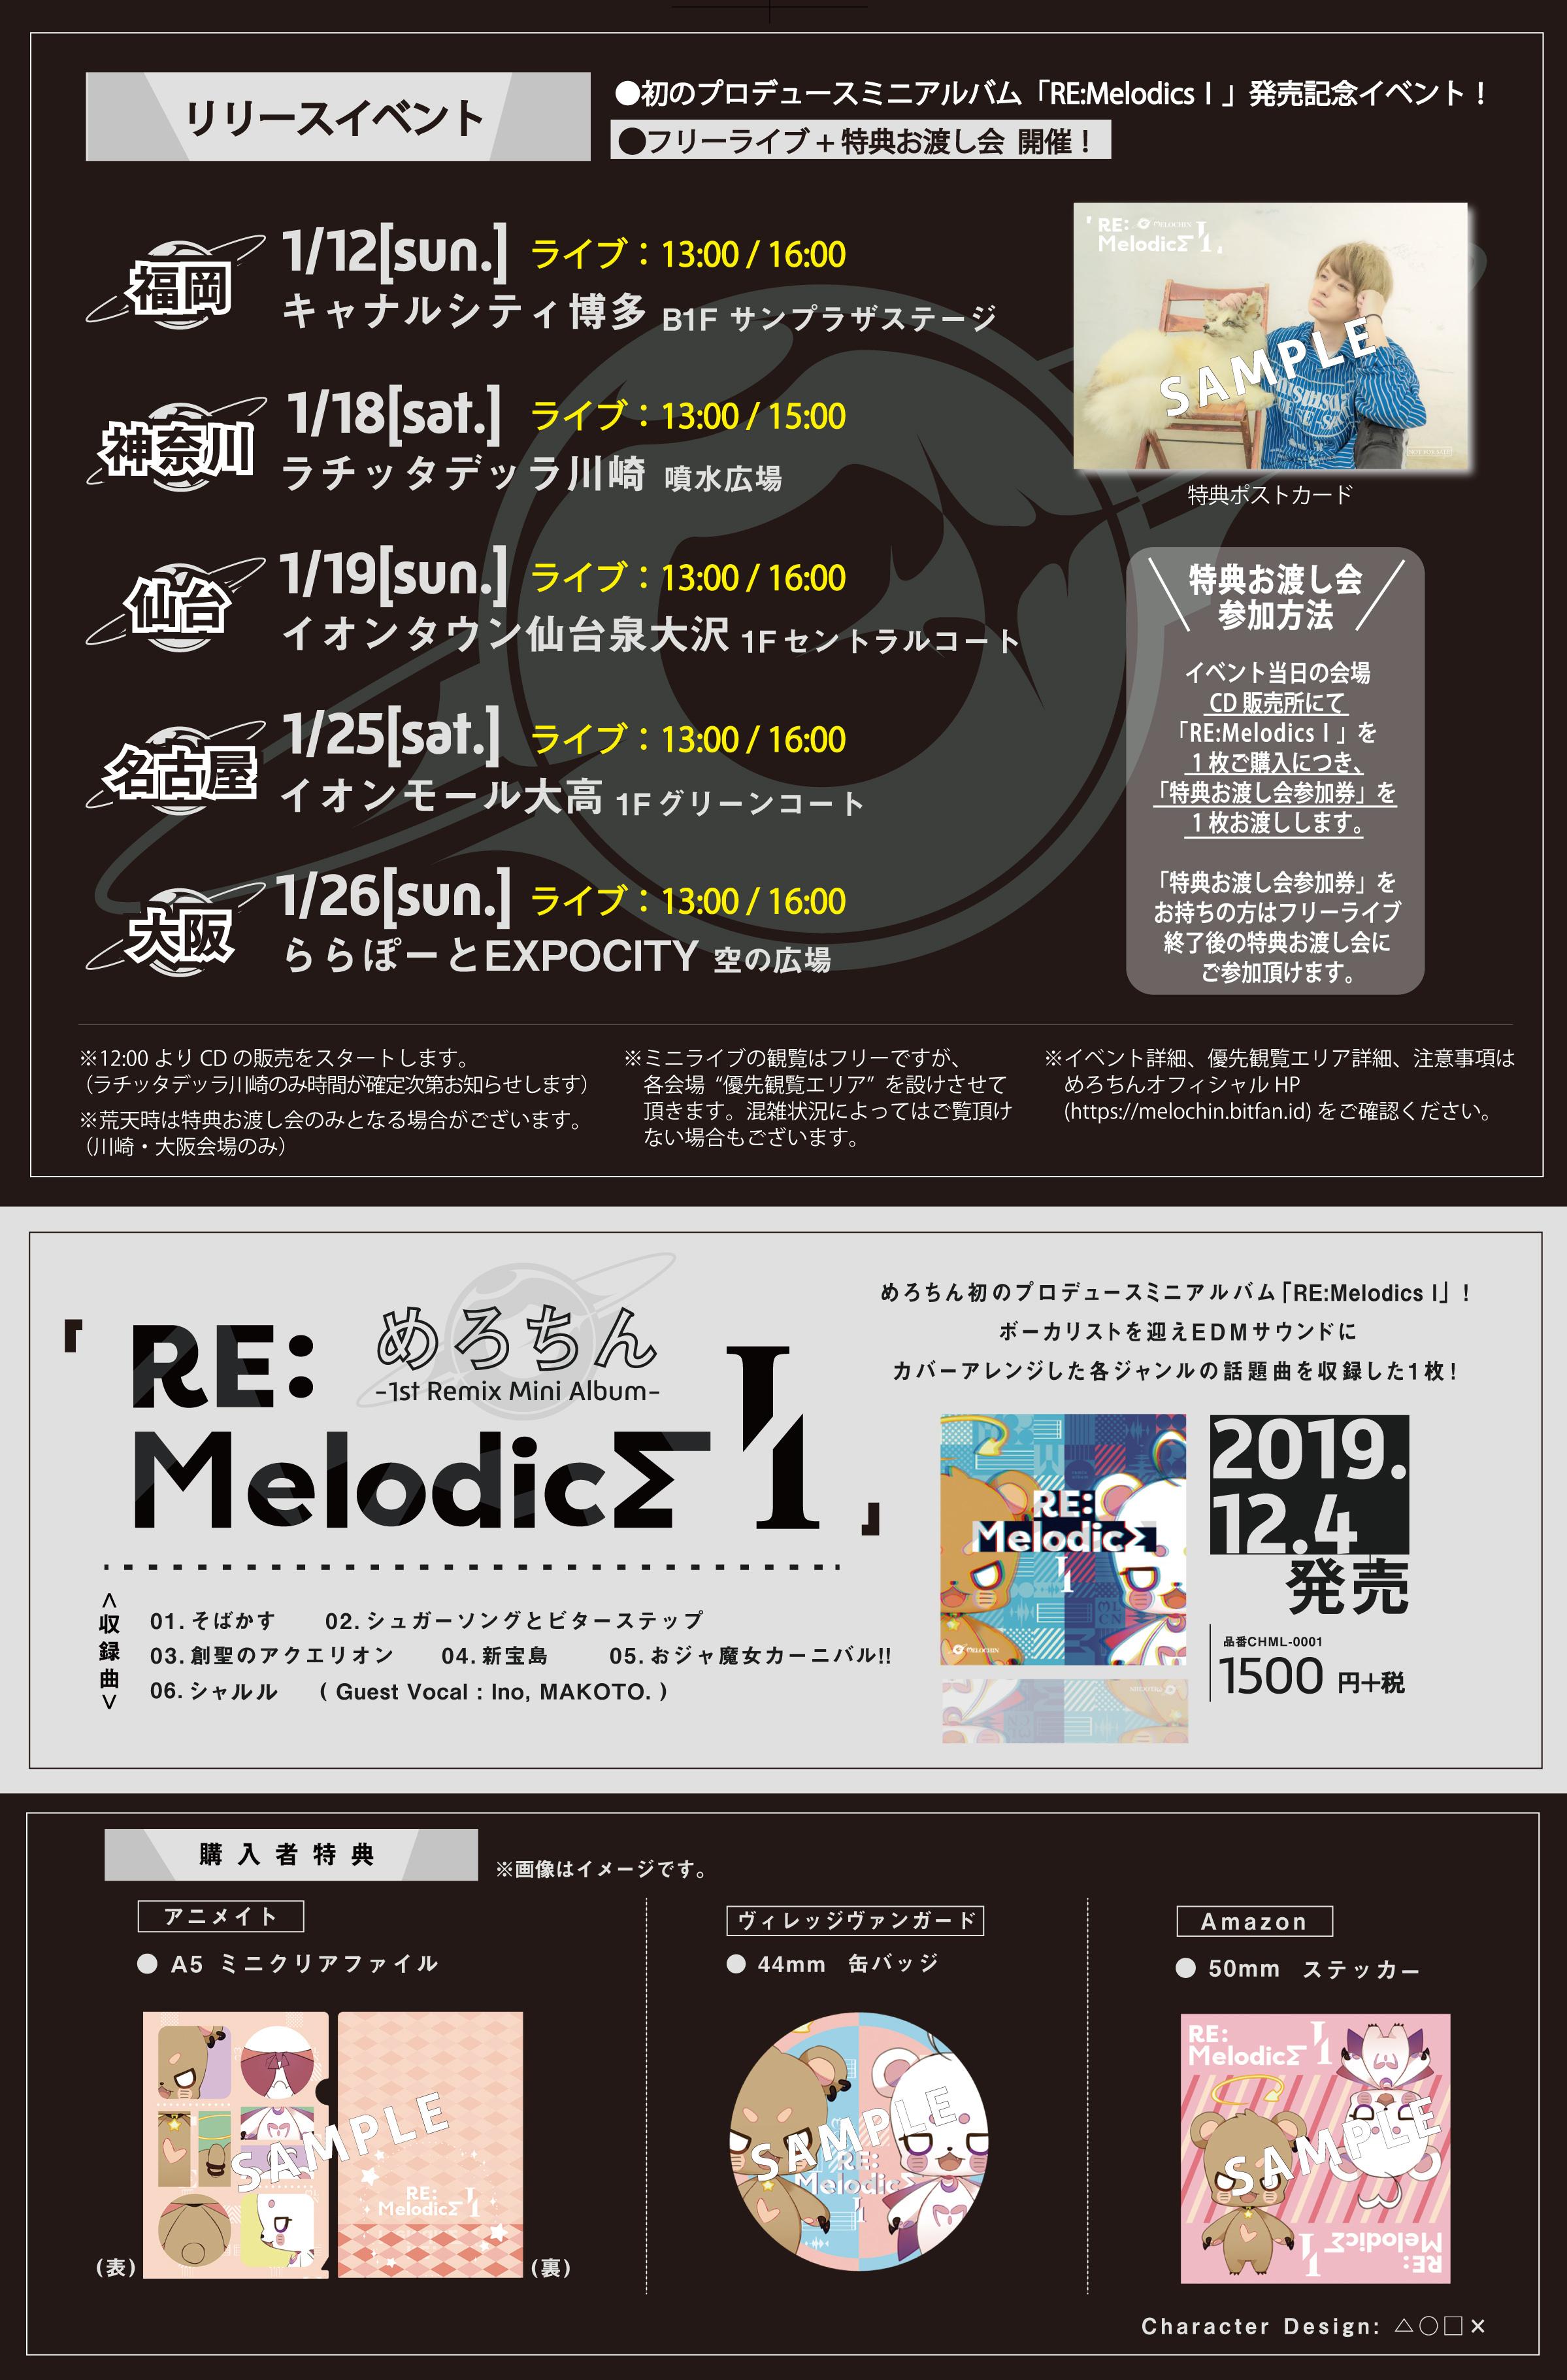 『RE:Melodics Ⅰ』発売記念イベント